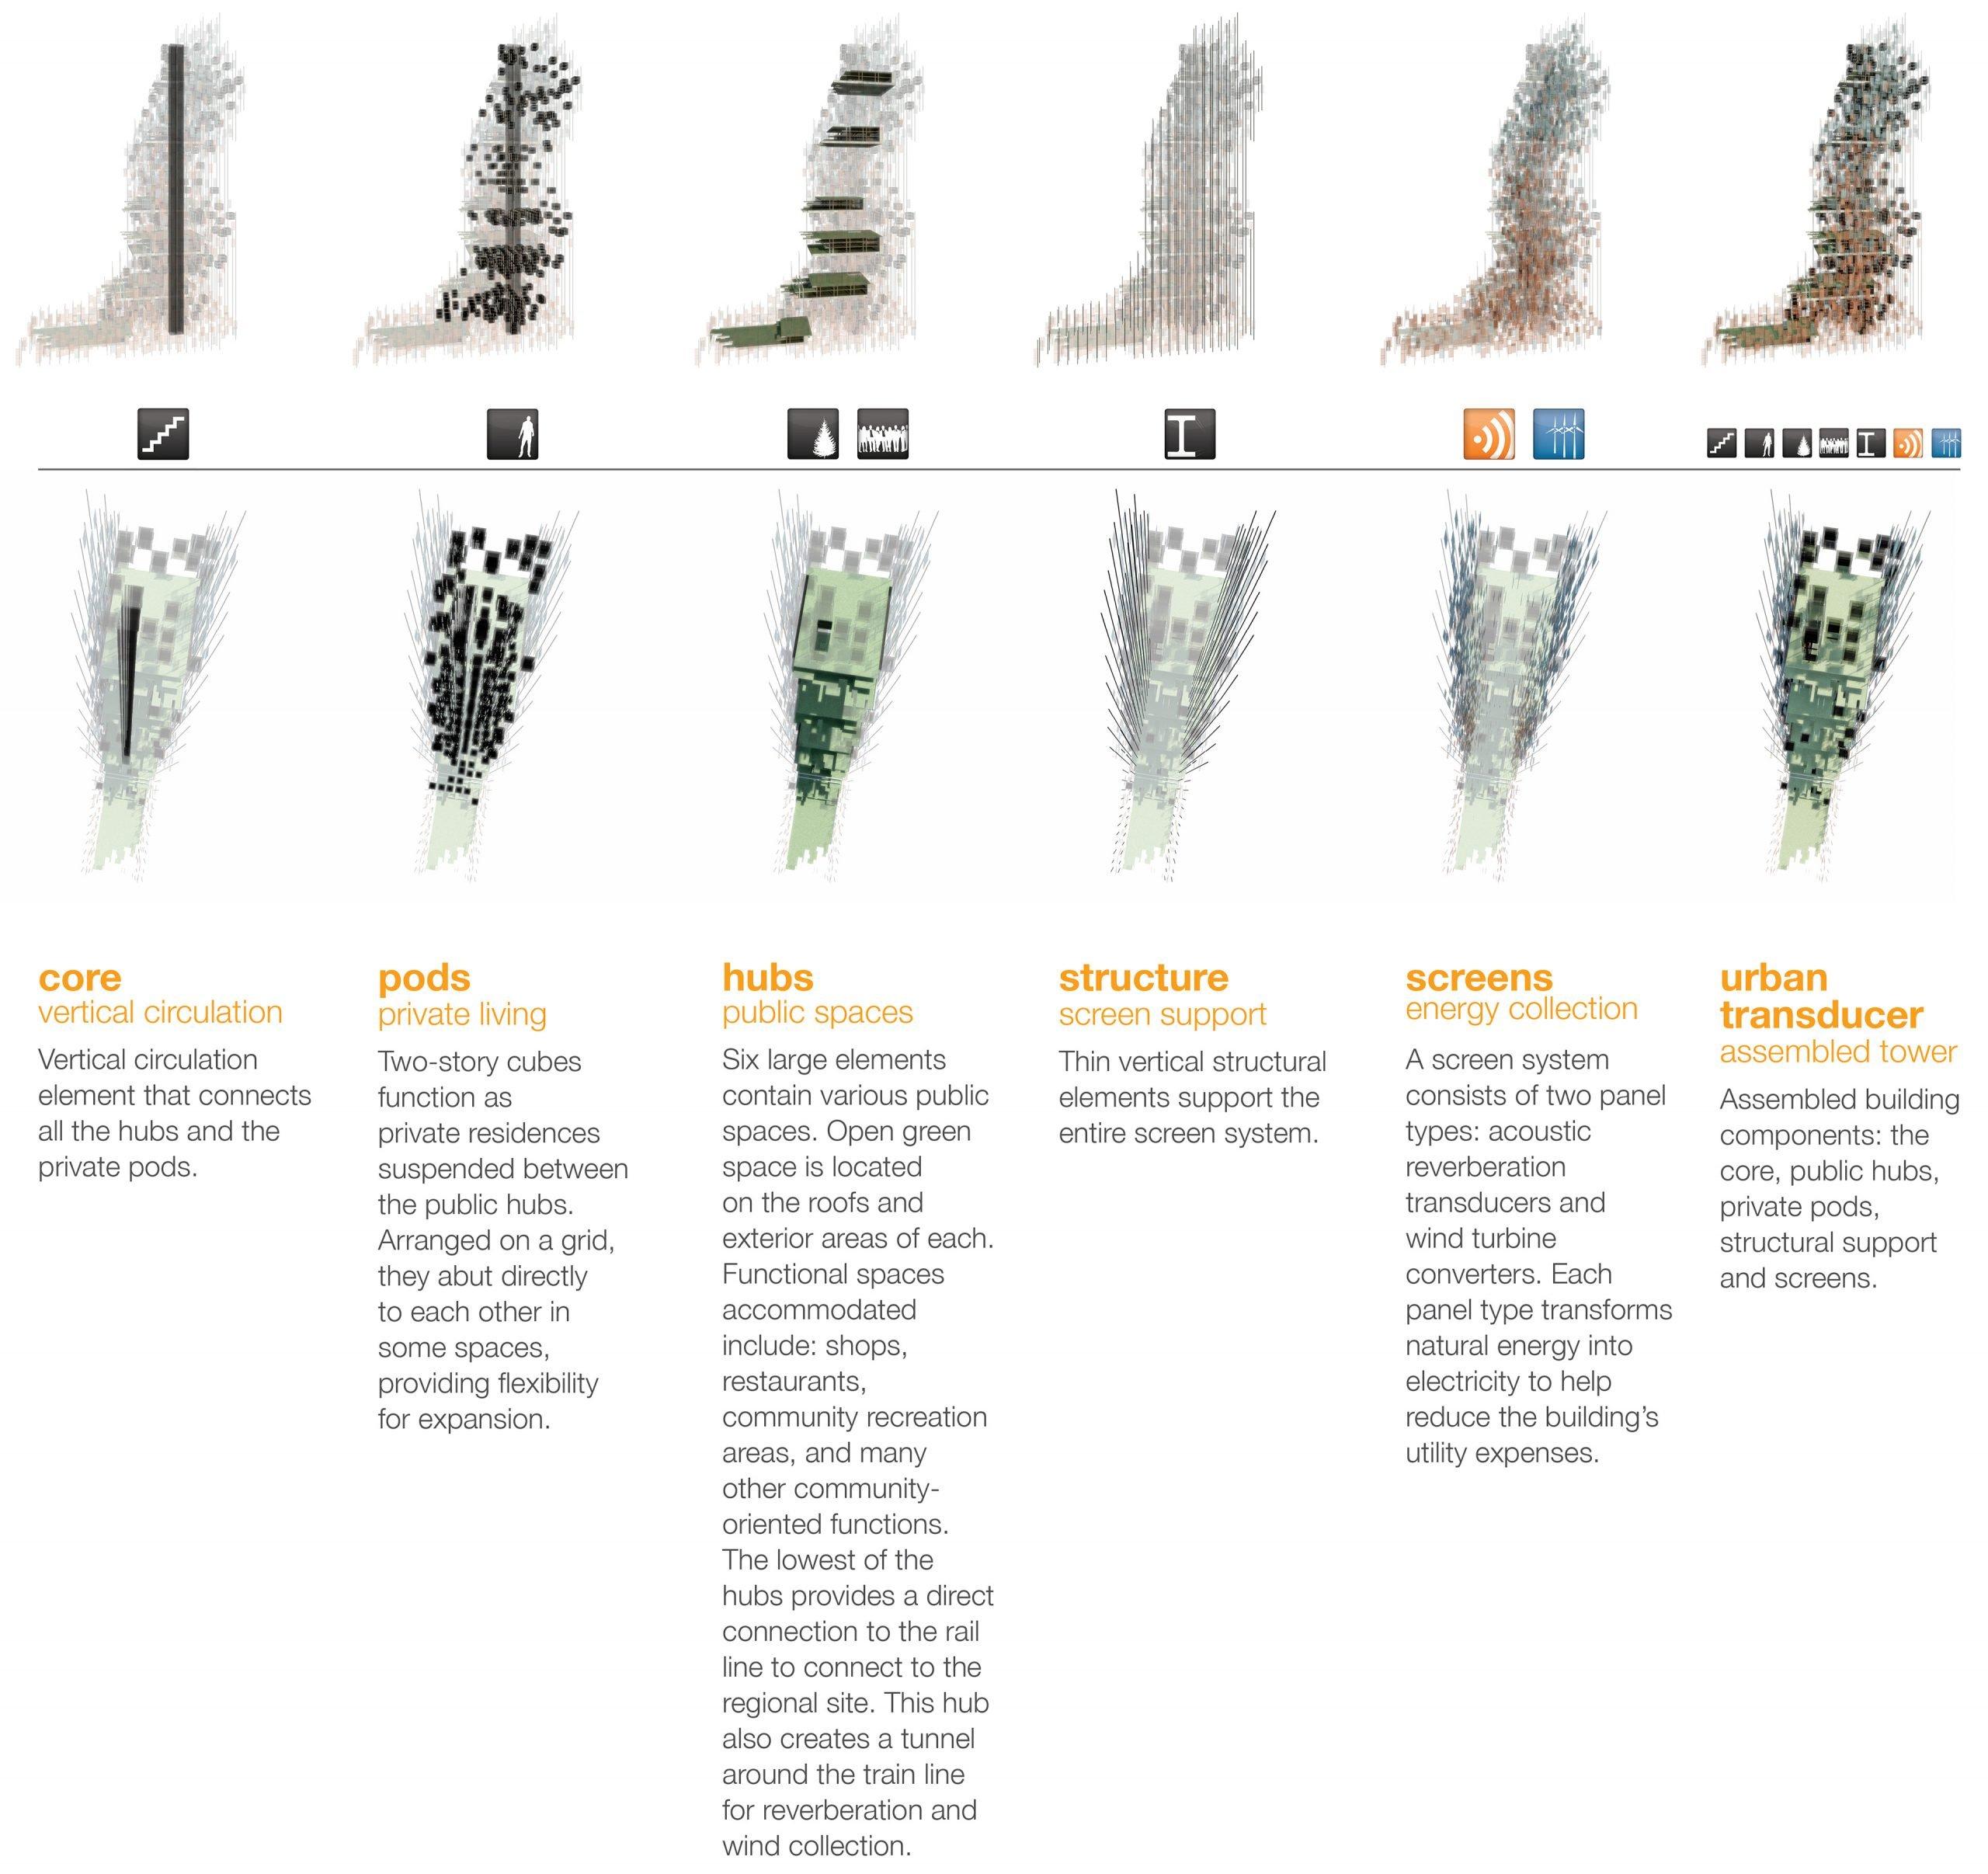 urban_transducer_core_elements